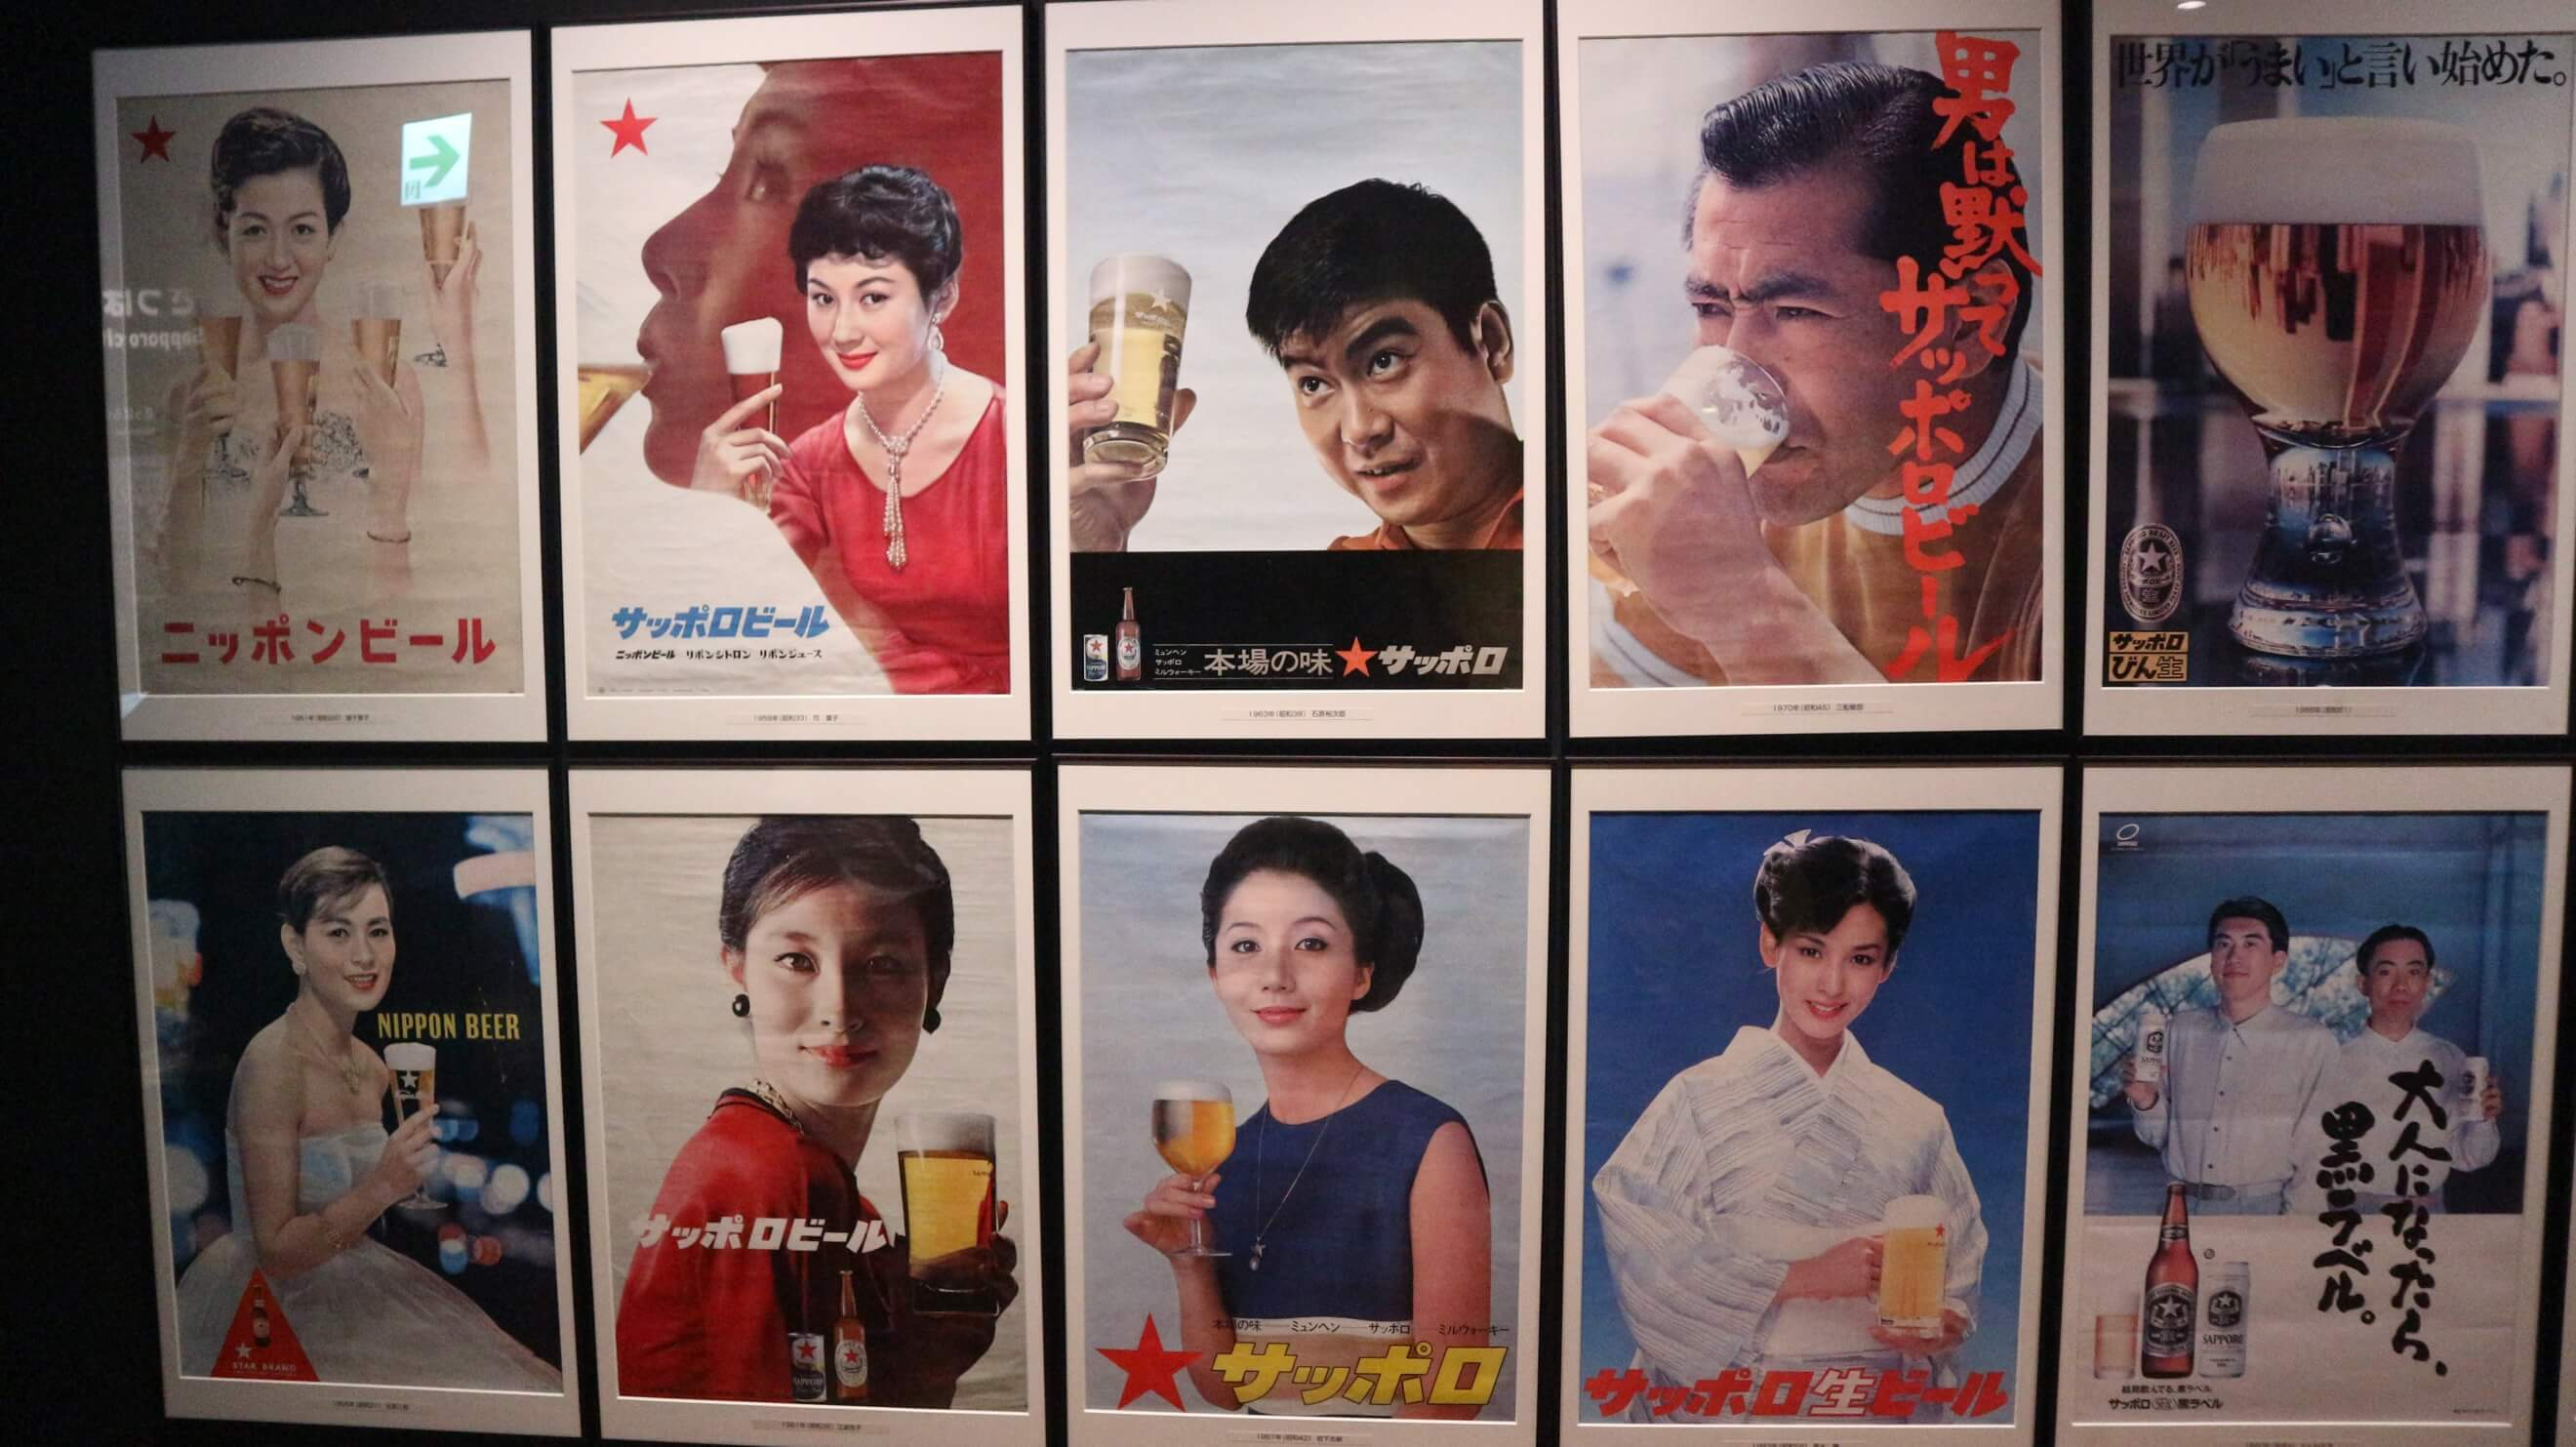 sapporo bira muzesi - eski reklamlar - hokkaido gezi rehberi kuzey japonya